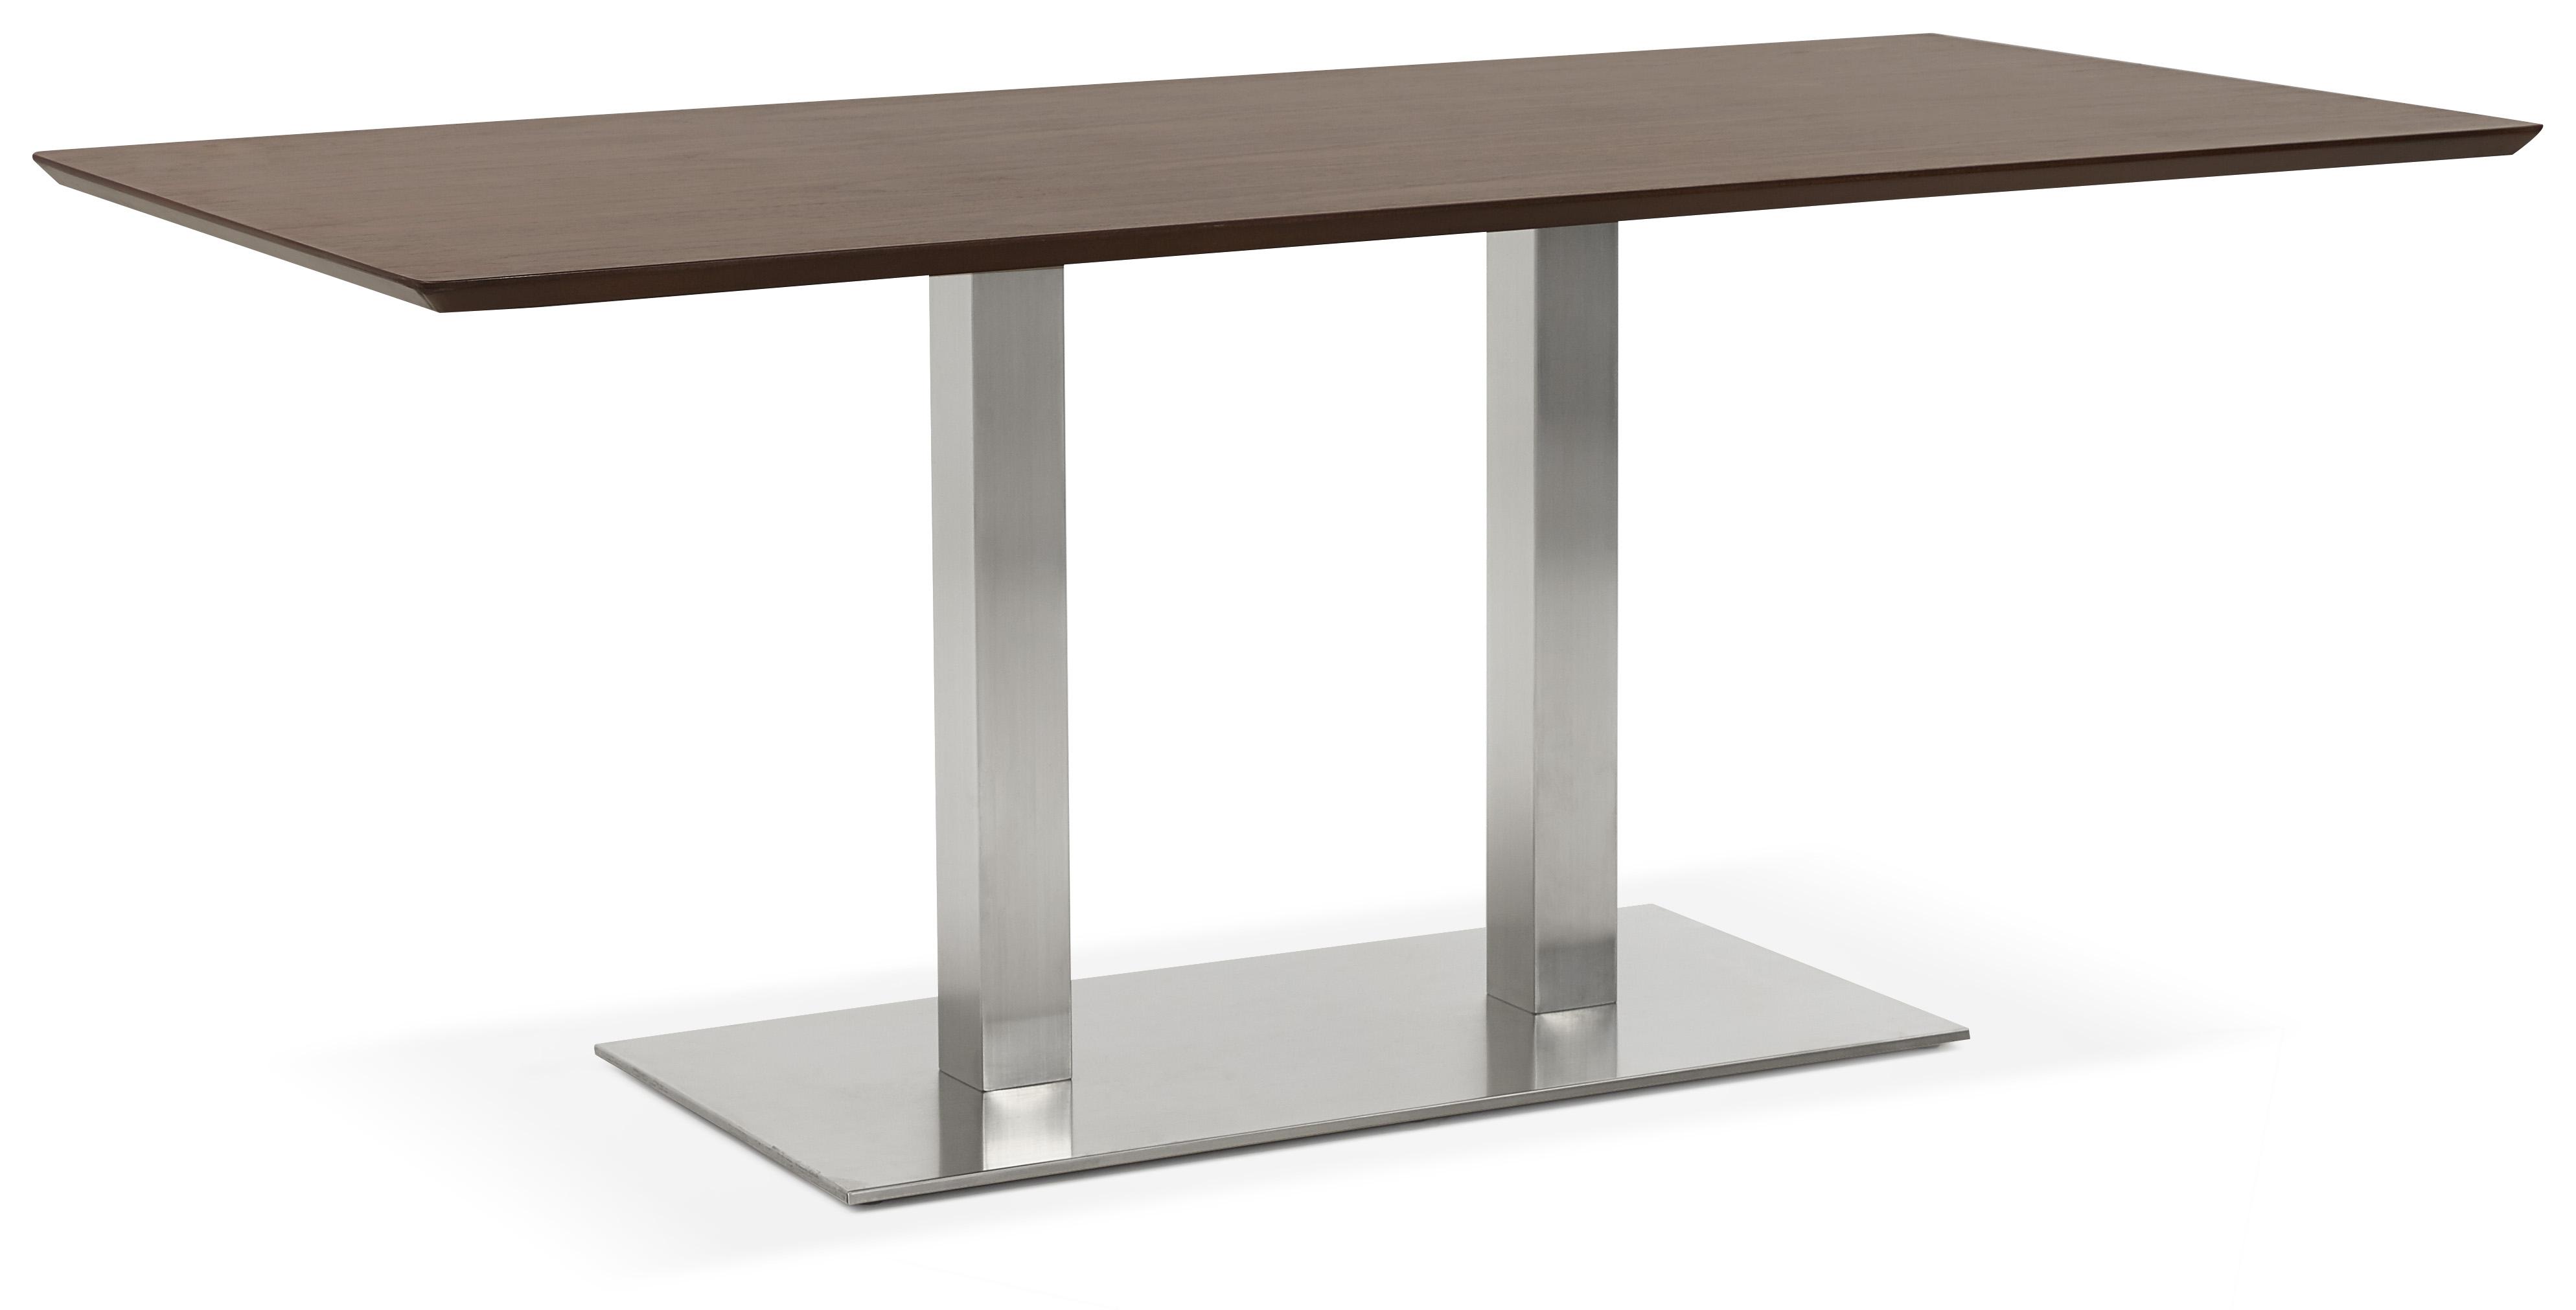 Moderne Eettafel Hout.Kokoon Design Eettafel Recta Kleur Hout